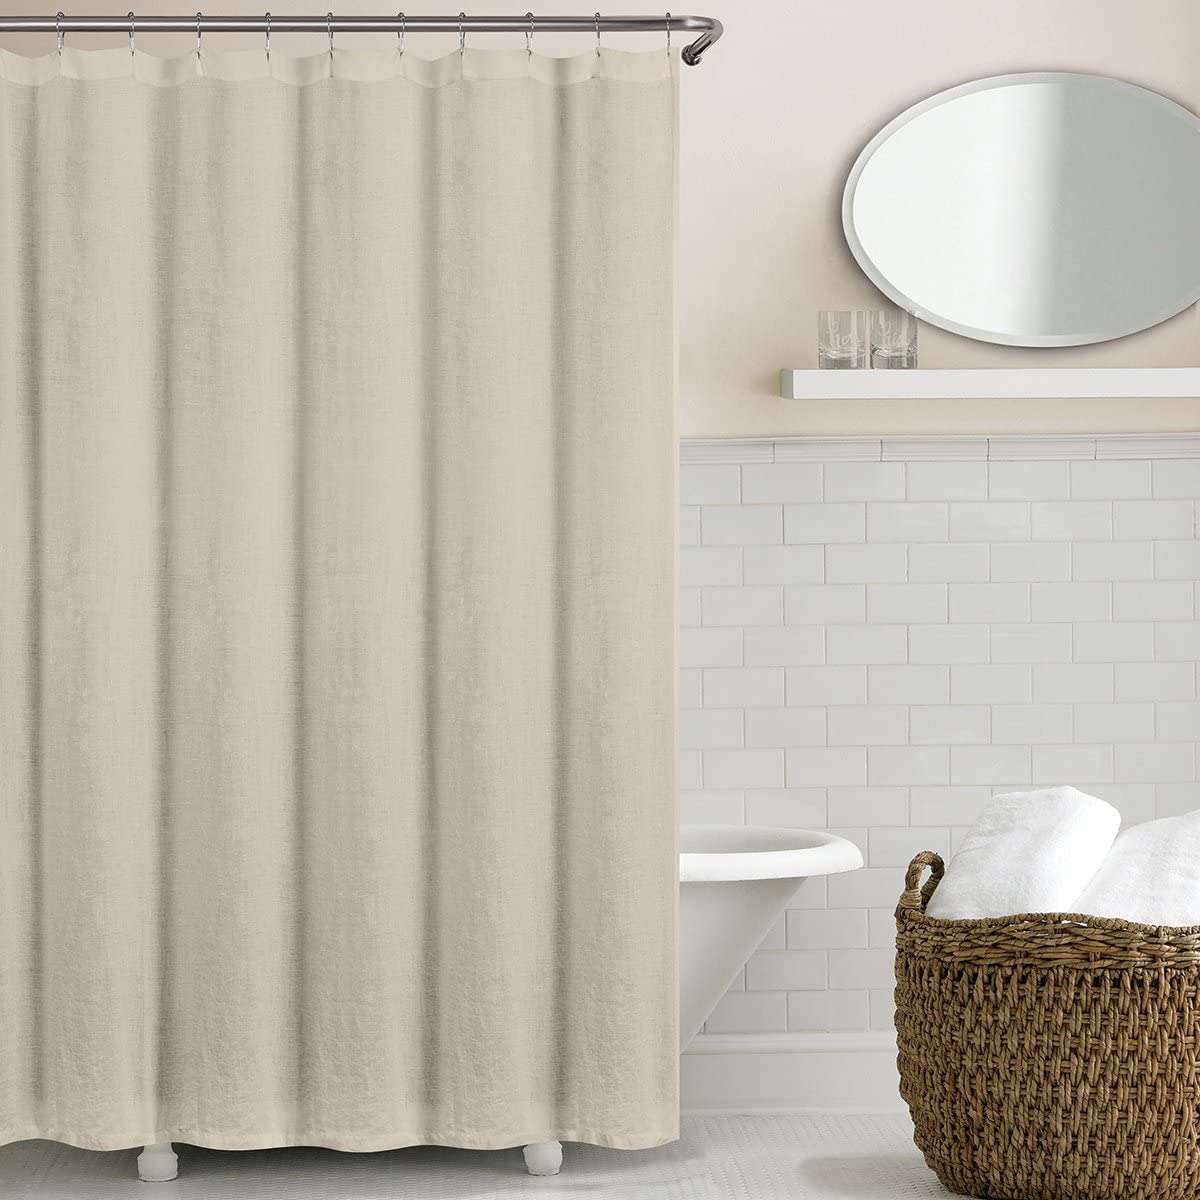 Echelon Home Washed Belgian Linen Shower Curtain, Stone